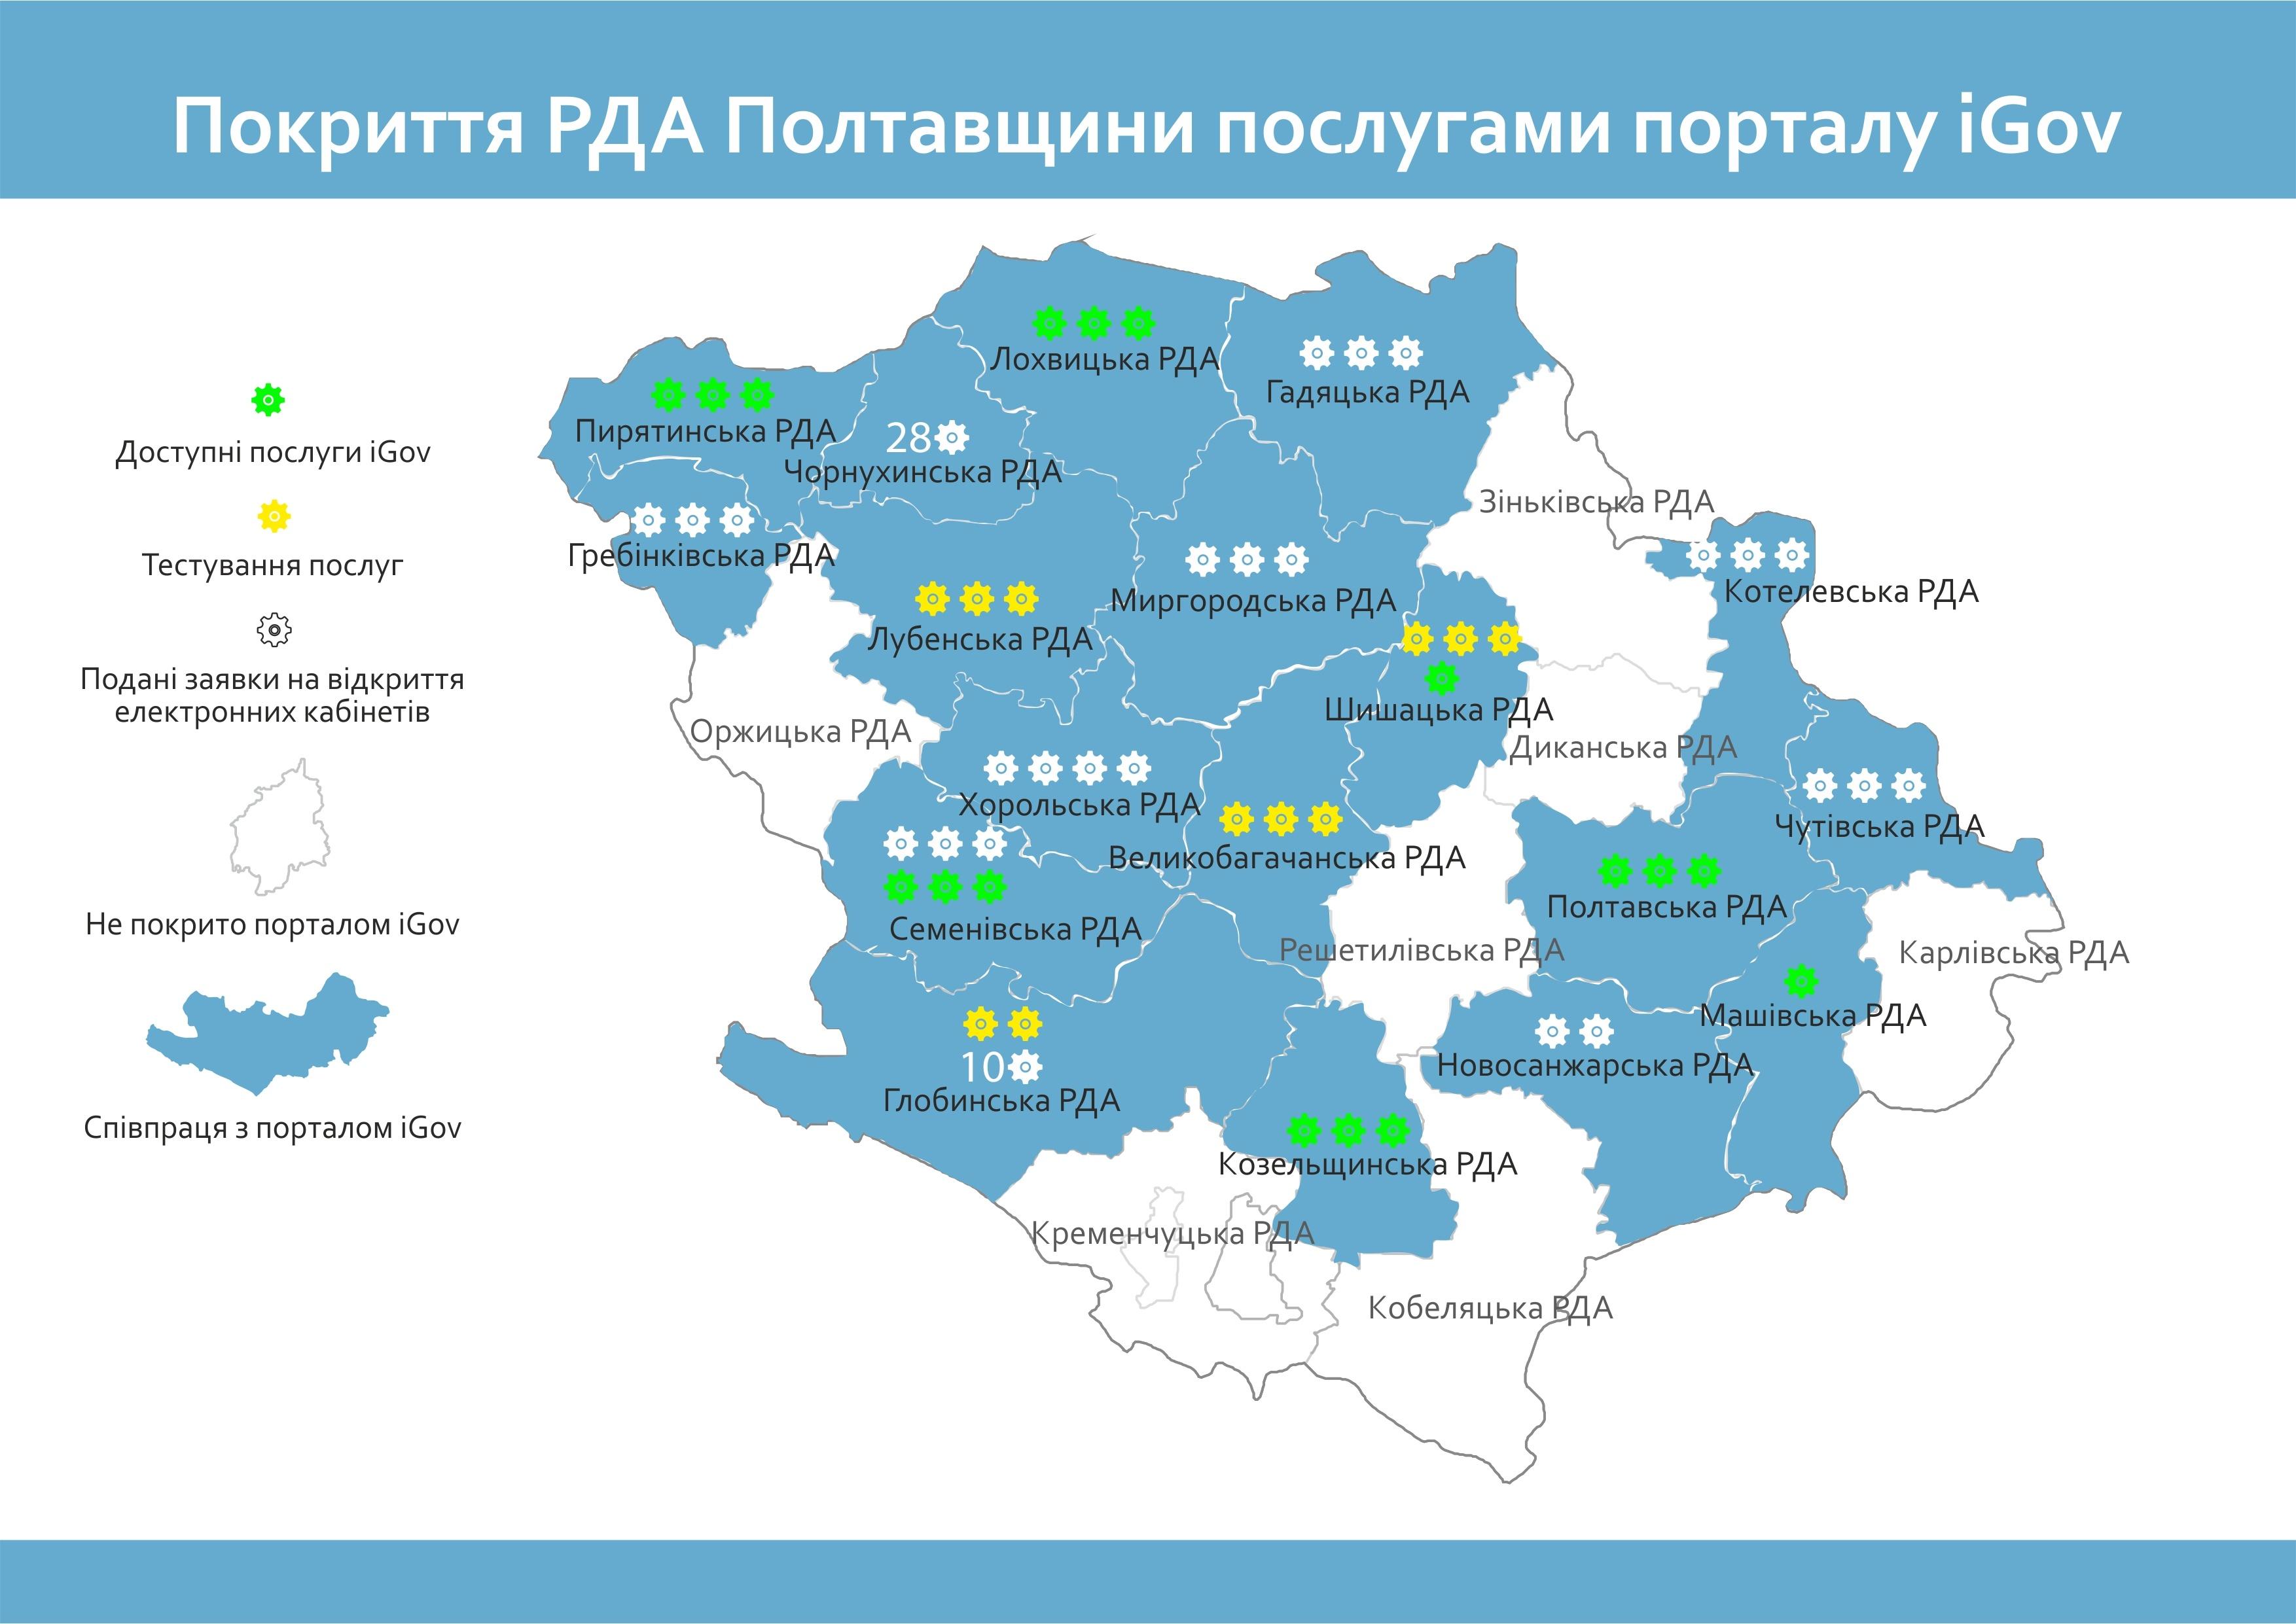 Покриття РДА Полтавщини послугами порталу iGov